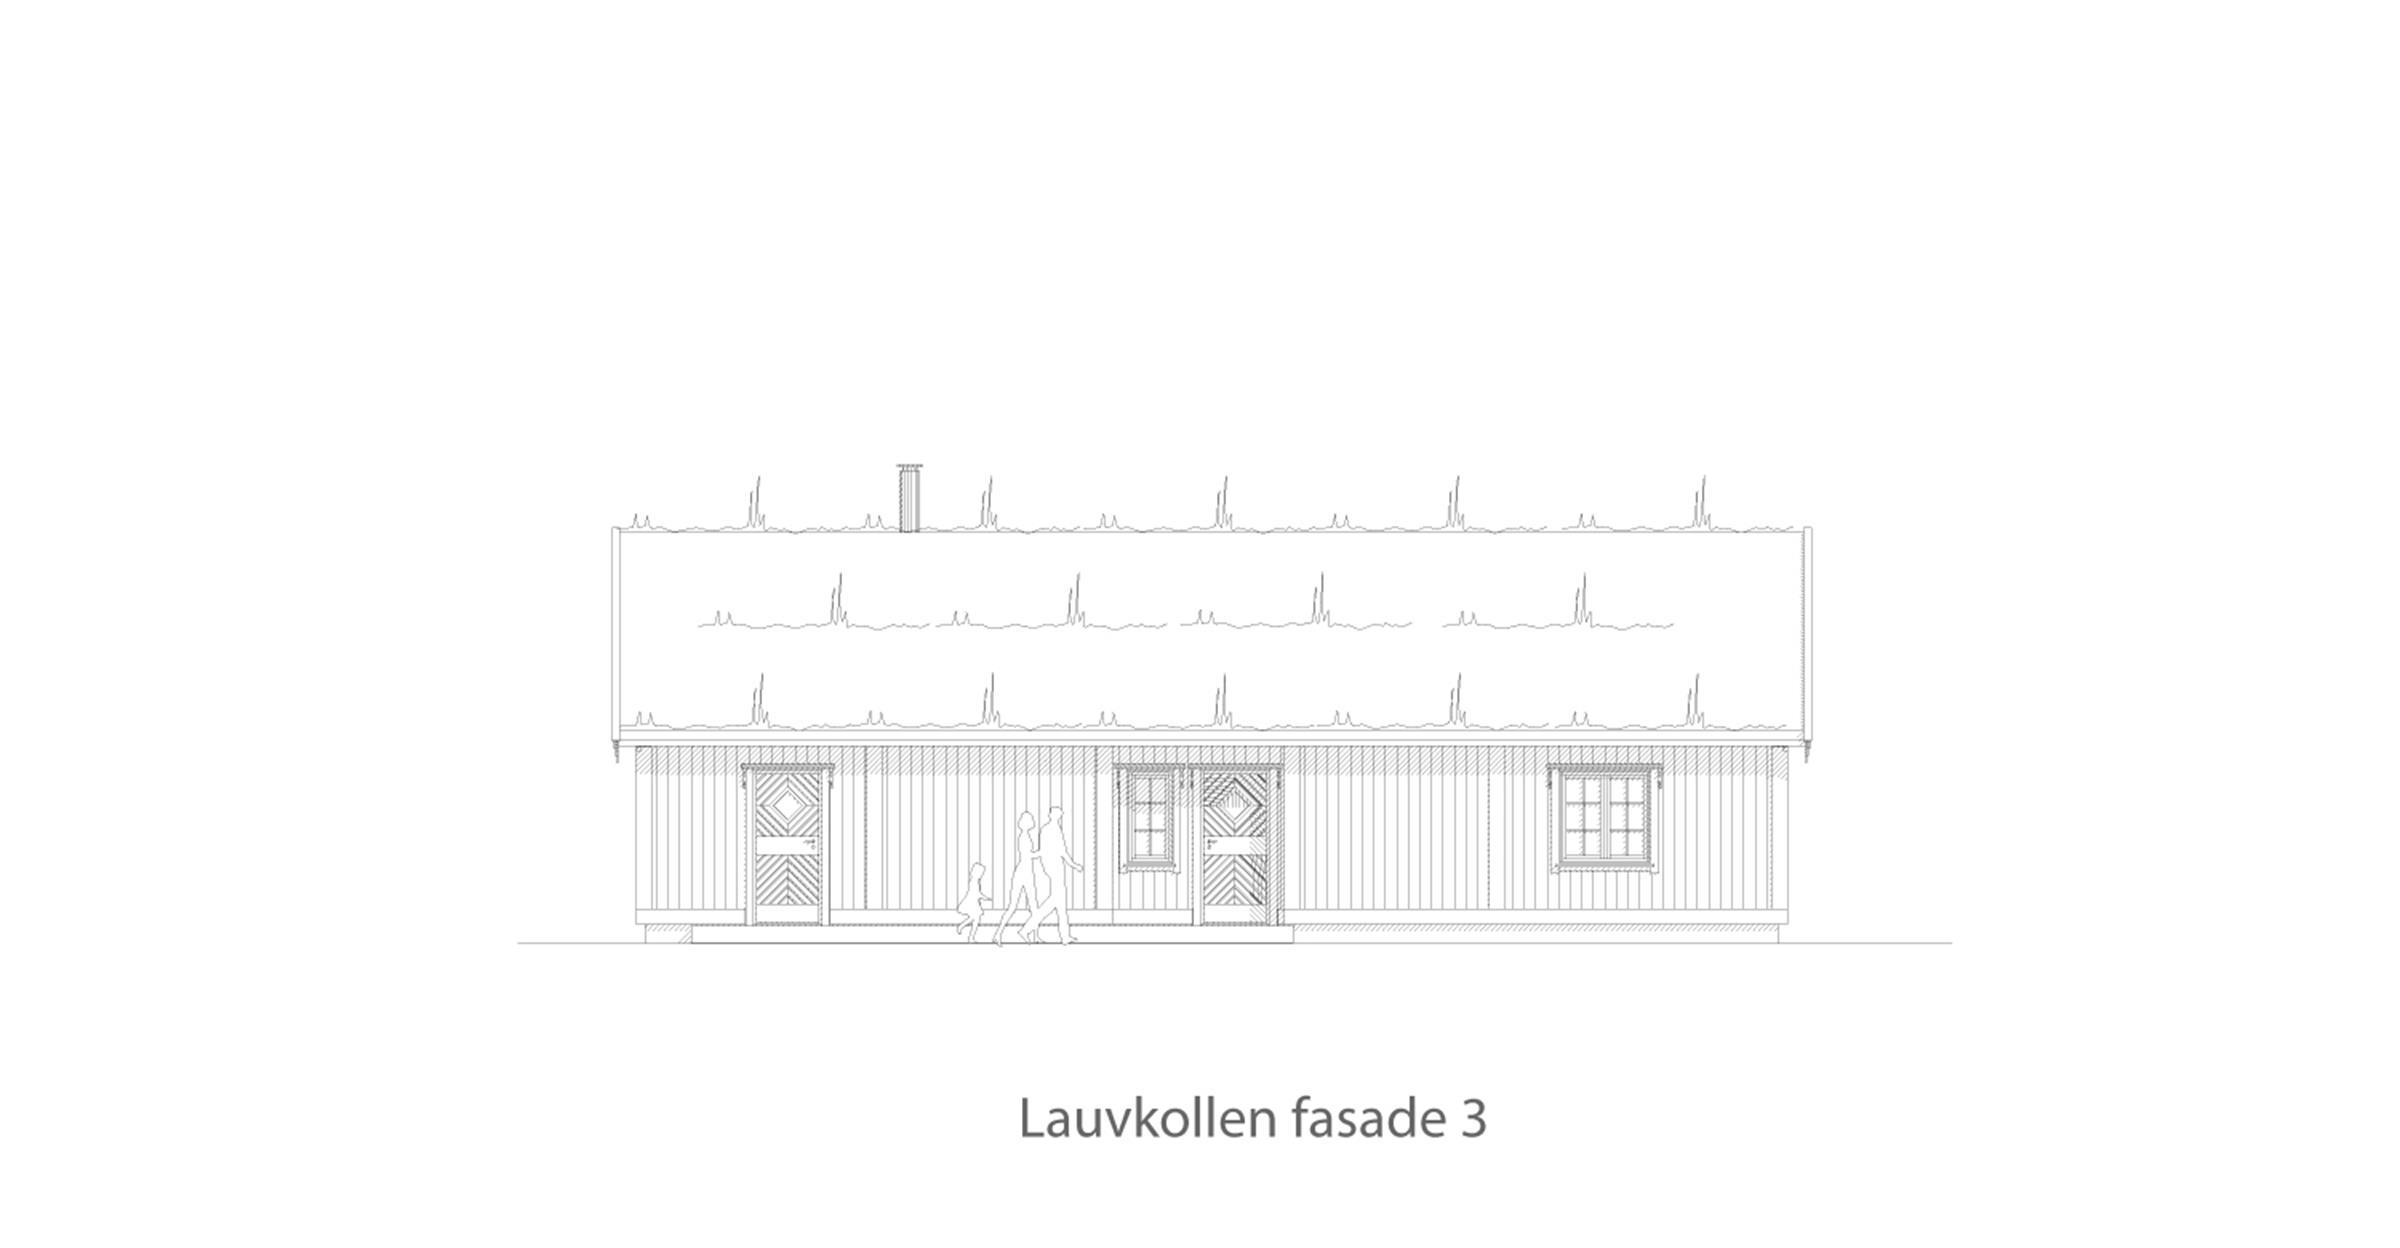 Lauvkollen fasade 3